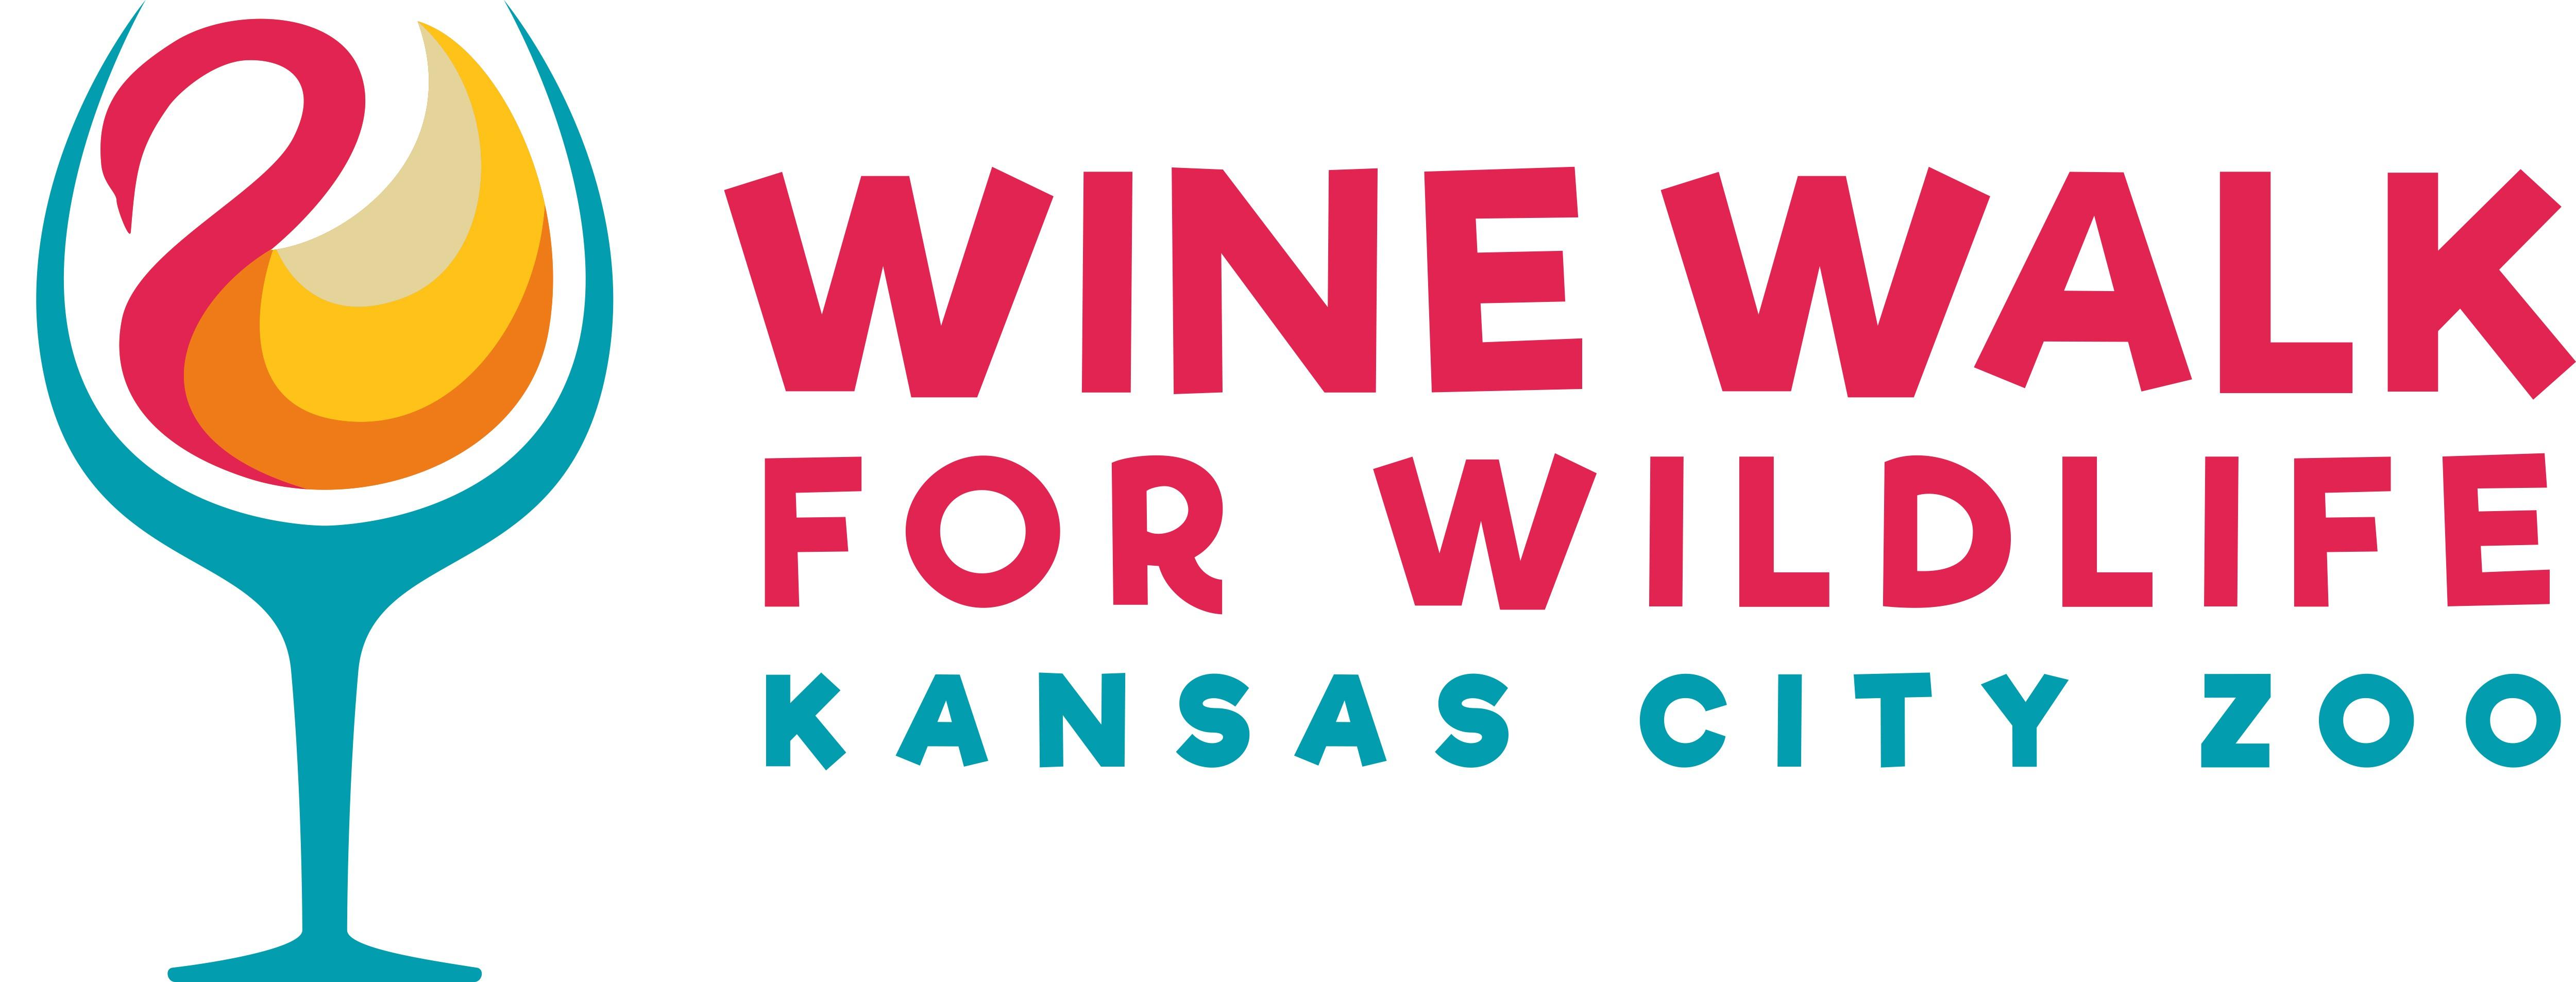 Wine Walk for Wildlife